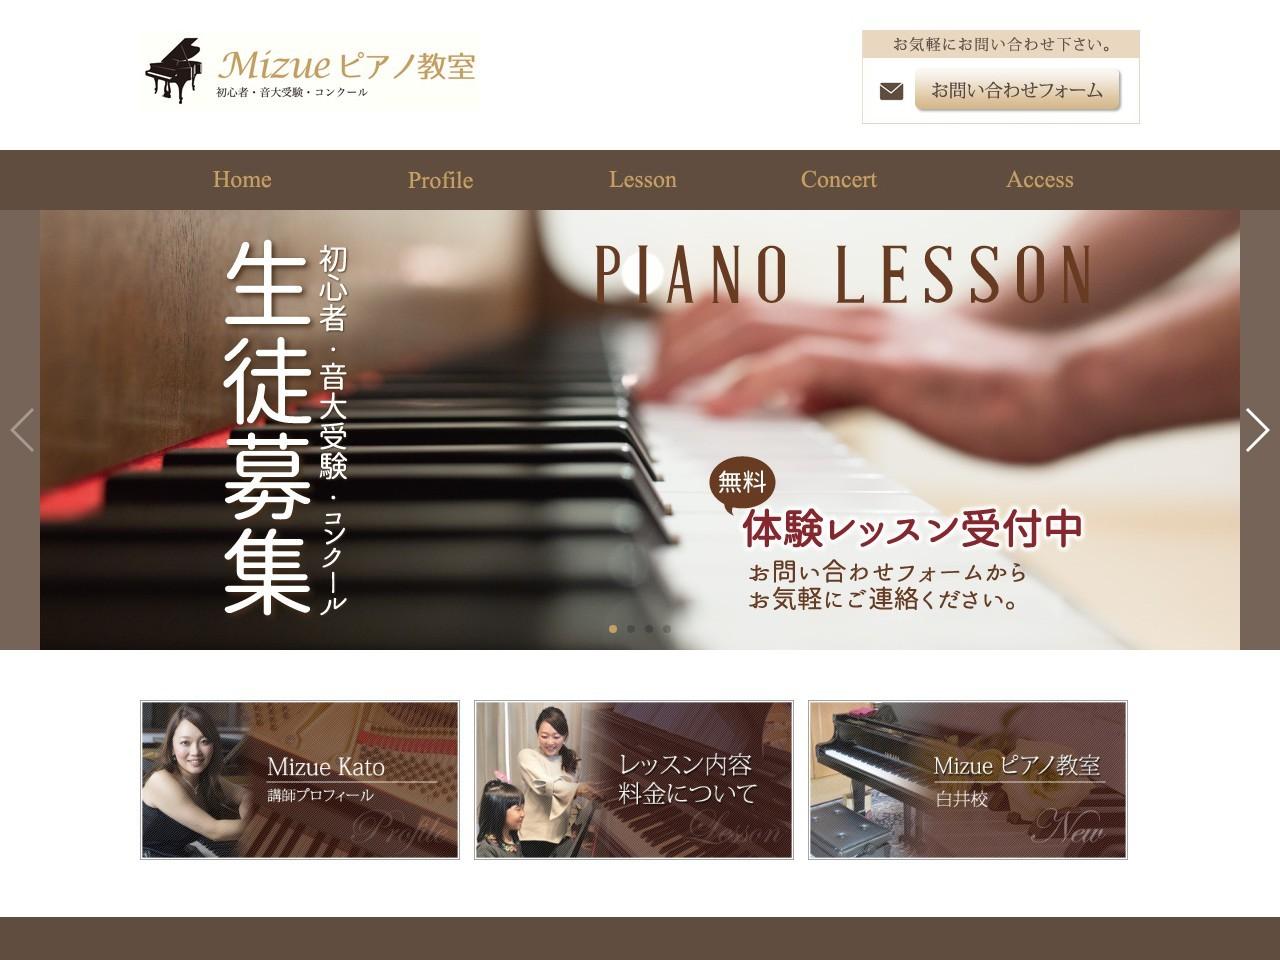 Mizueピアノ教室のサムネイル